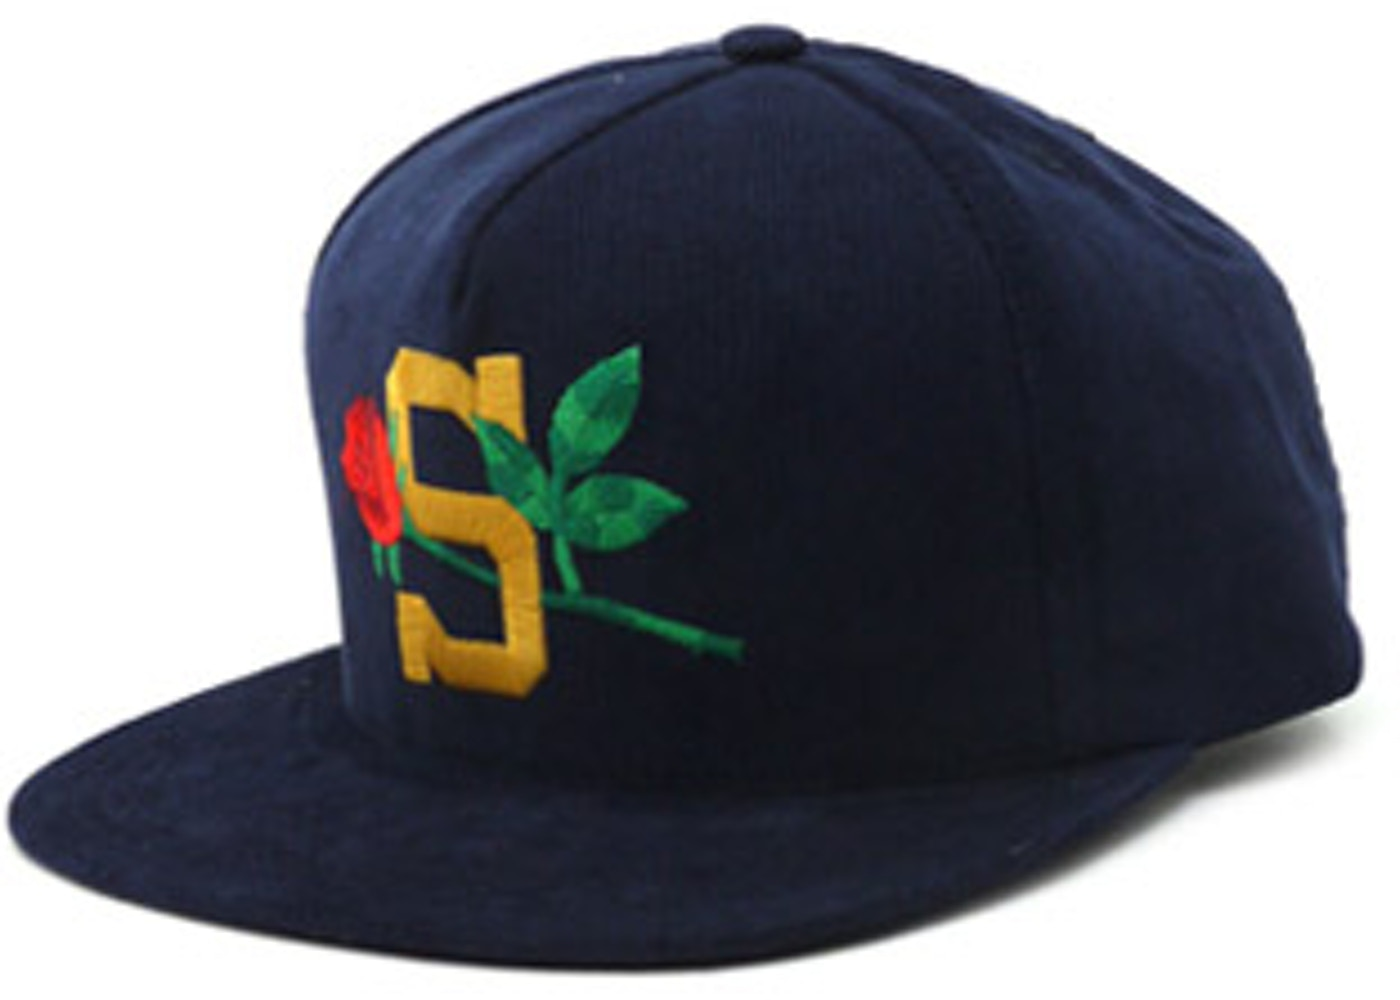 8665d110 Supreme S Logo 6 Panel Cap Hat Navy Blue 3M | eBay